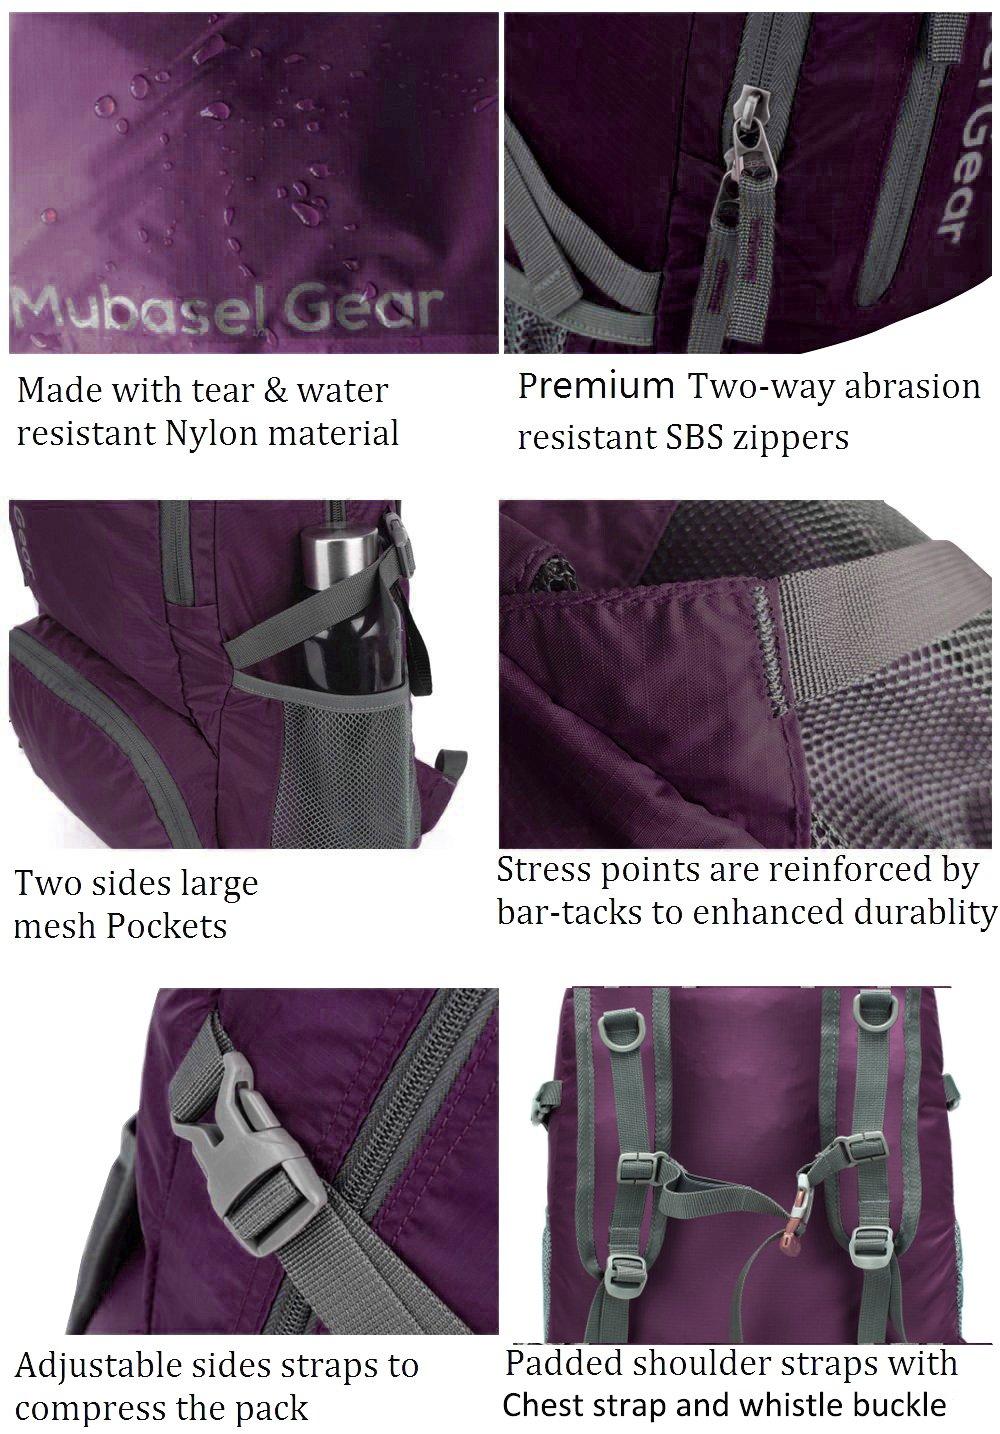 Mubasel Gear Backpack - Lightweight Backpacks for Travel Hiking - Daypack for Women Men (Purple) by Mubasel Gear (Image #3)